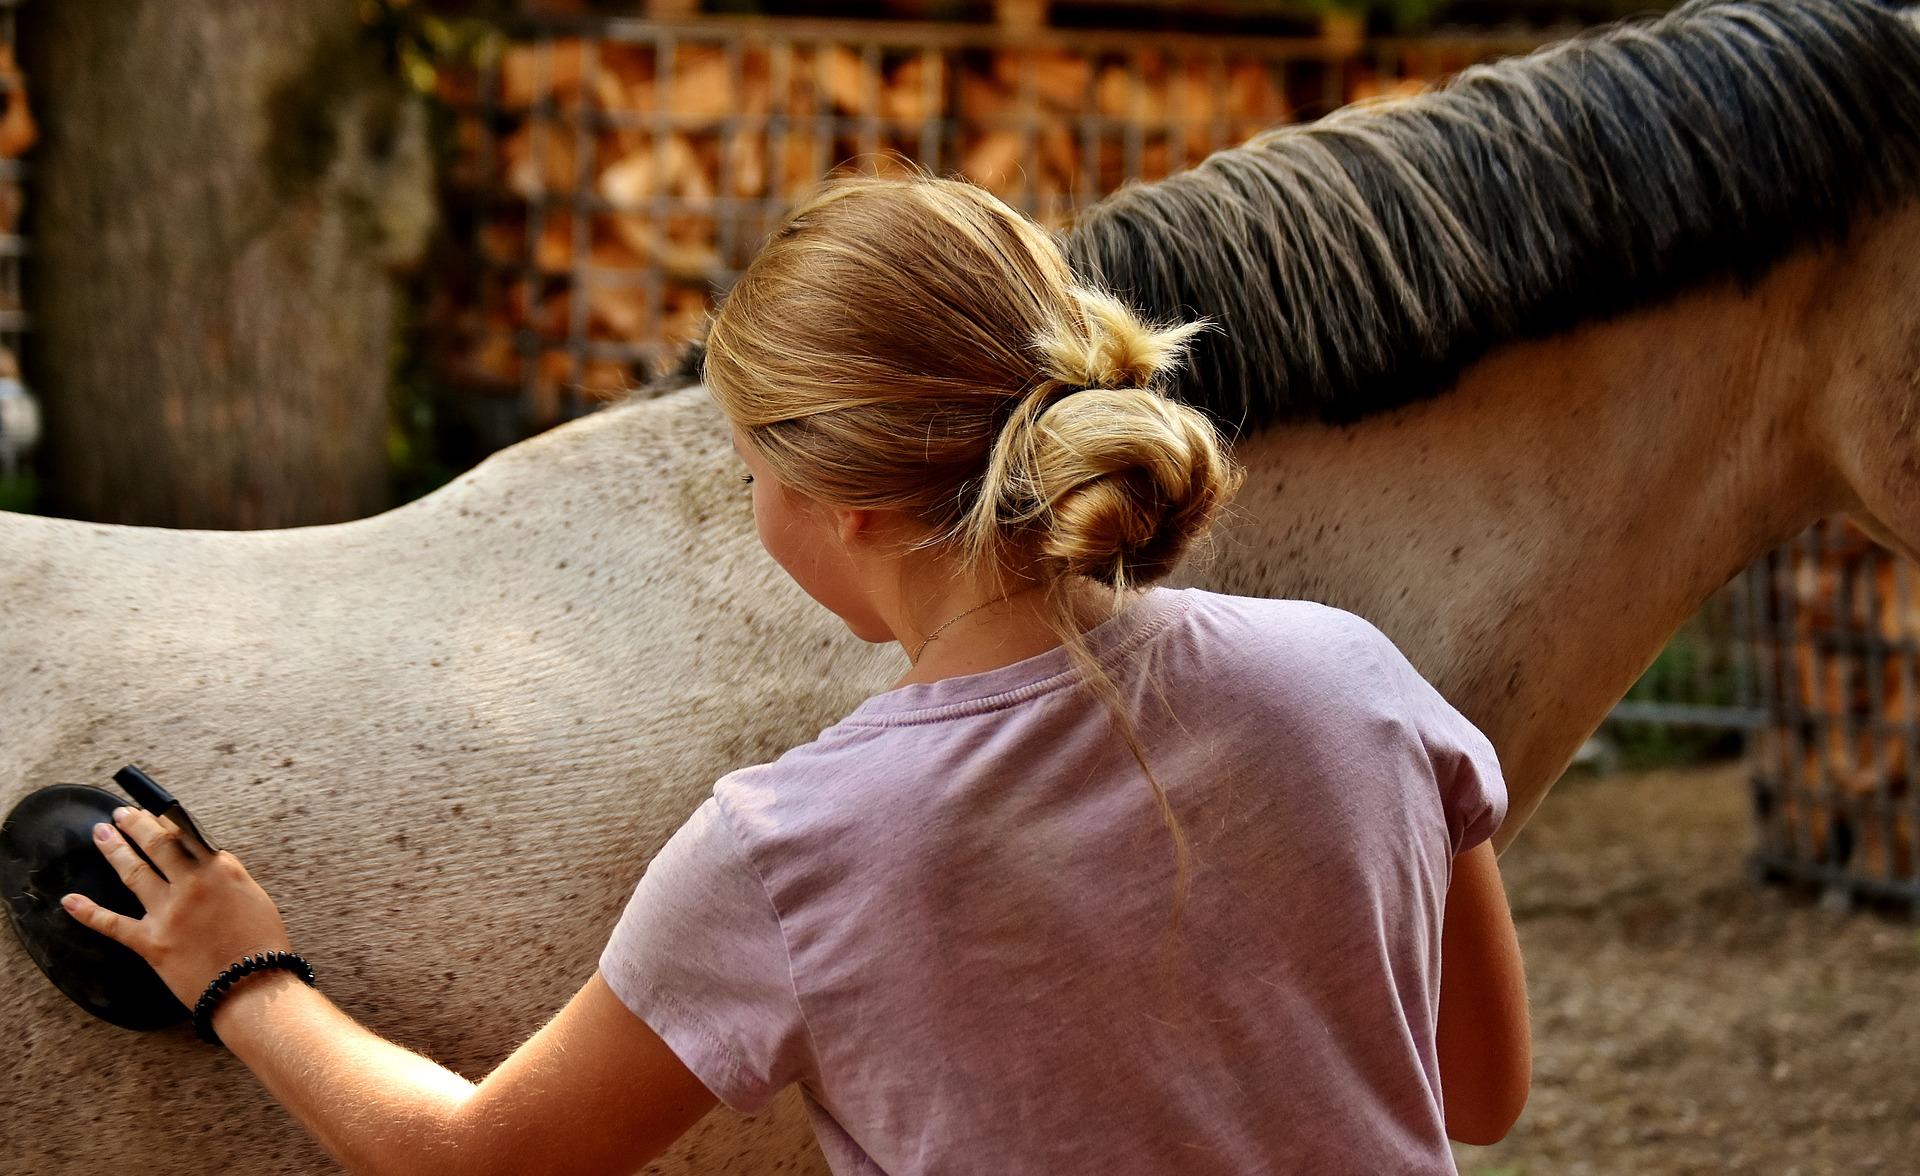 horse-2818941_1920.jpg